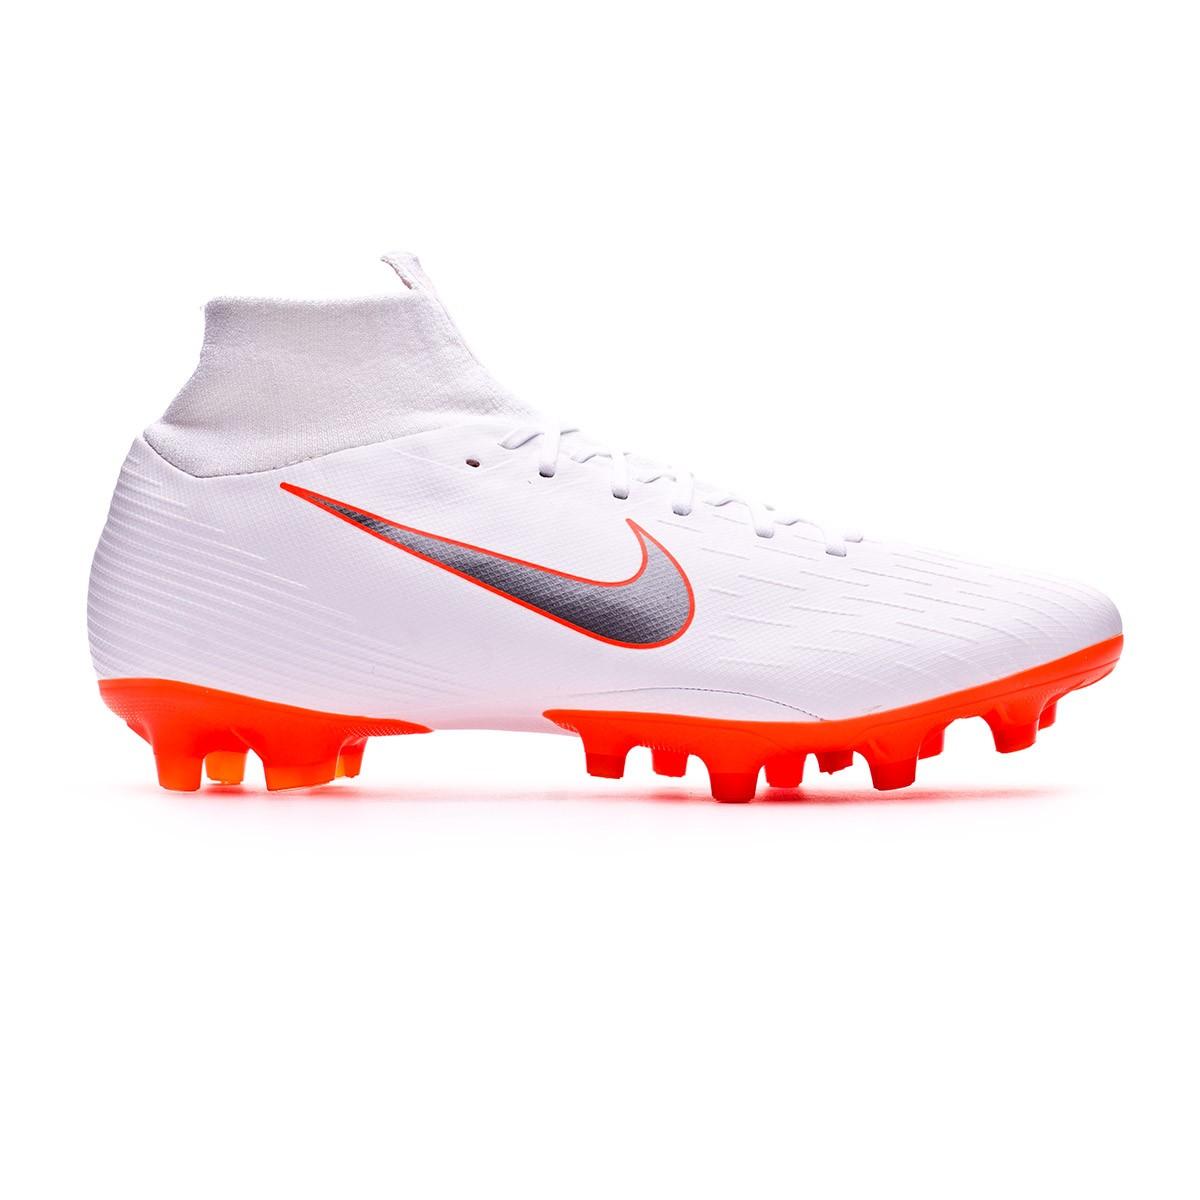 246af53cfa5 Football Boots Nike Mercurial Superfly VI Pro AG-Pro White-Metallic cool  grey-Total orange - Tienda de fútbol Fútbol Emotion